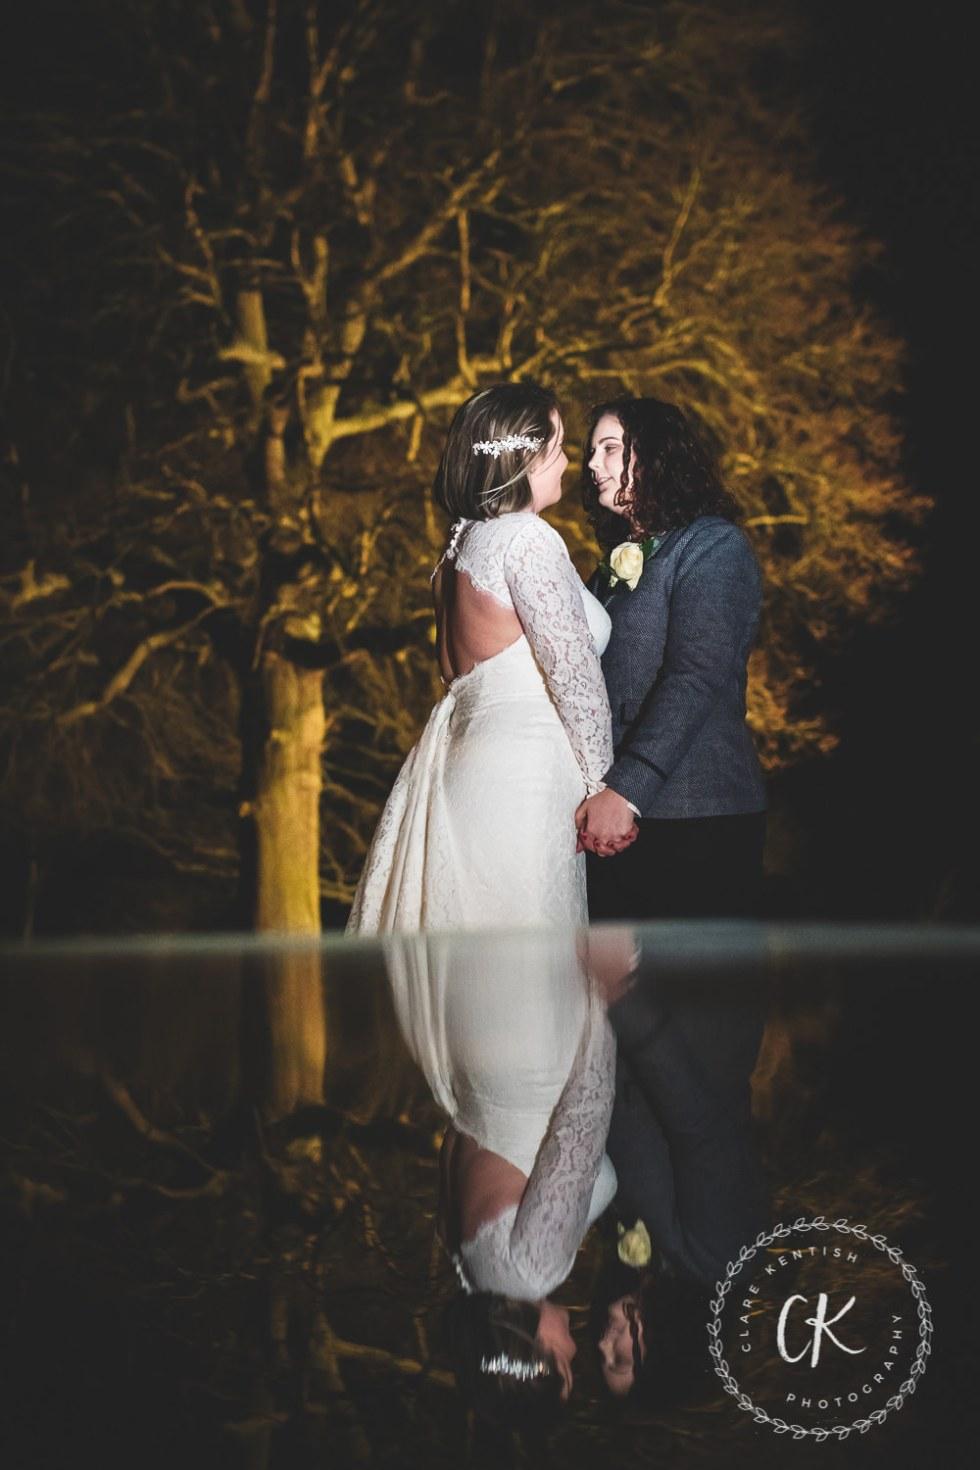 CCsp-Henry-Moore-Wedding-Brickendon-Grange-Herts-Hertfordshire_0015